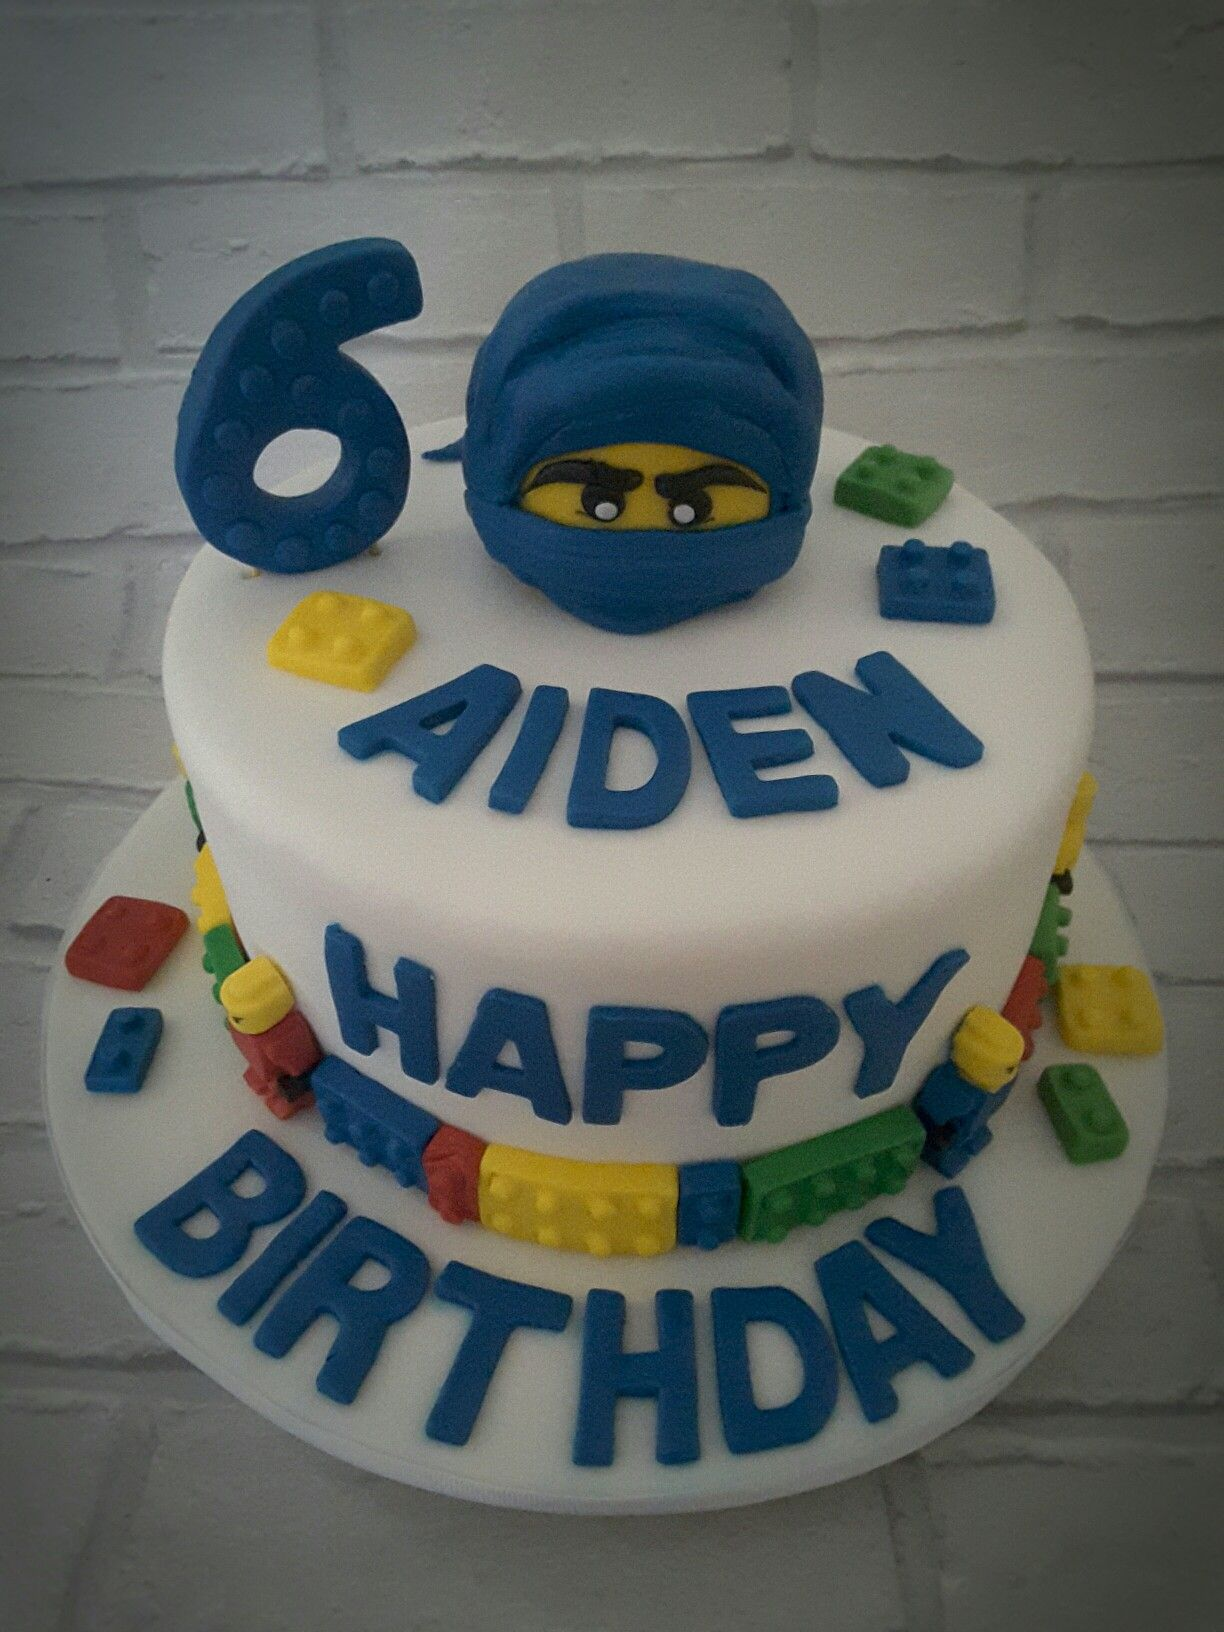 Marvelous Lego Ninjago Birthday Cake Blue Boy Birthday Cake Ninjago Funny Birthday Cards Online Alyptdamsfinfo